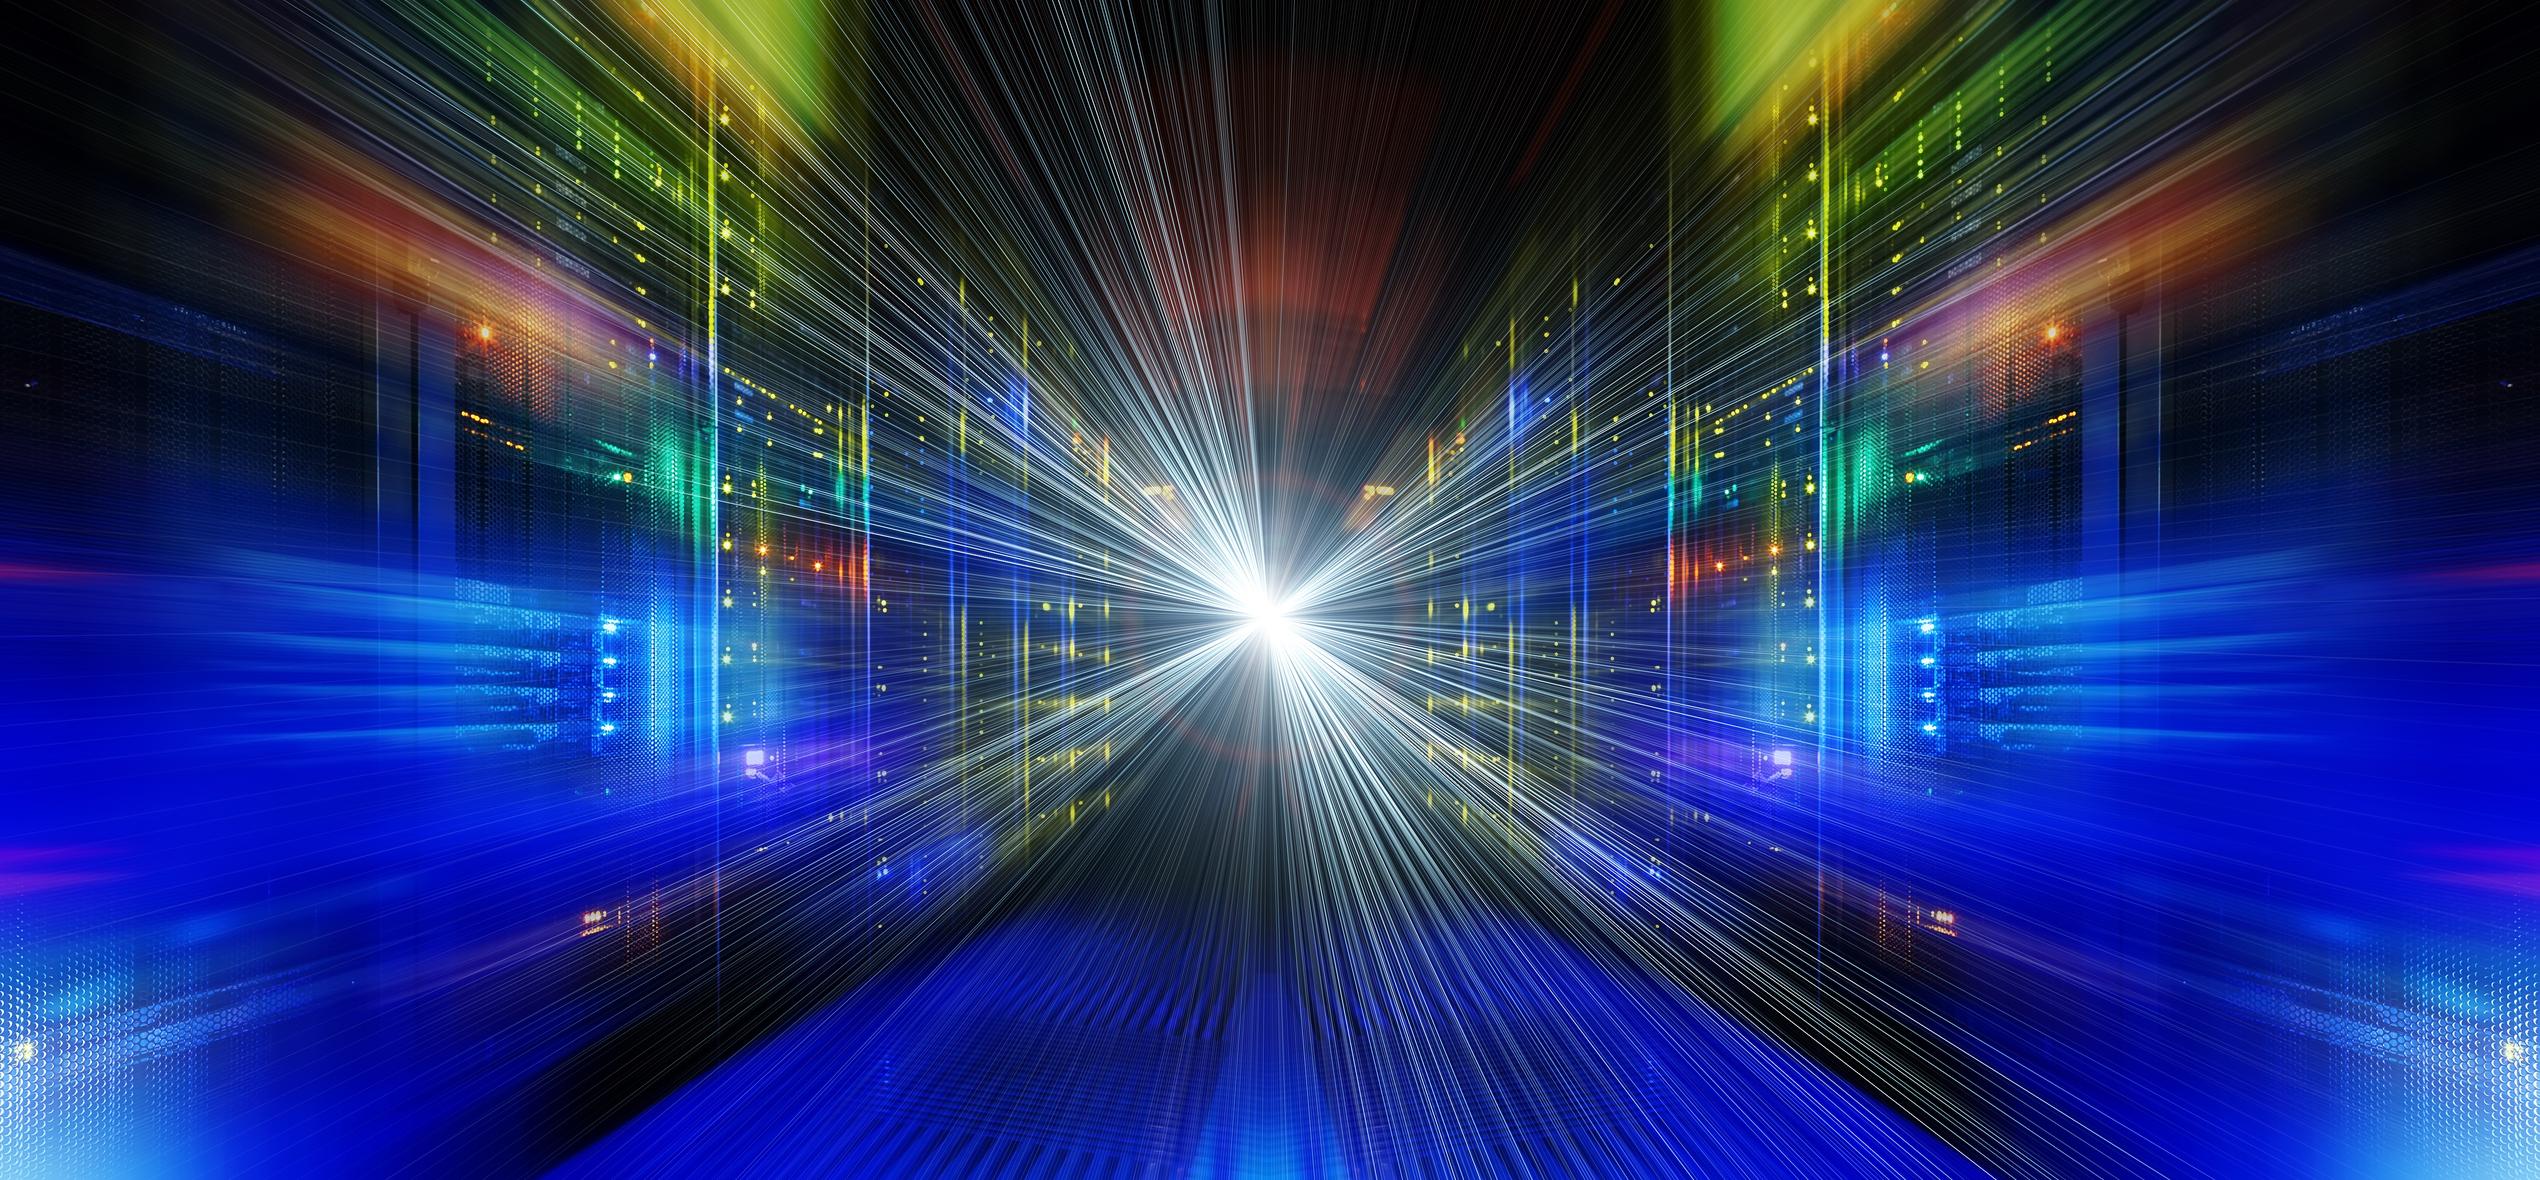 Stylized visualization of a data center